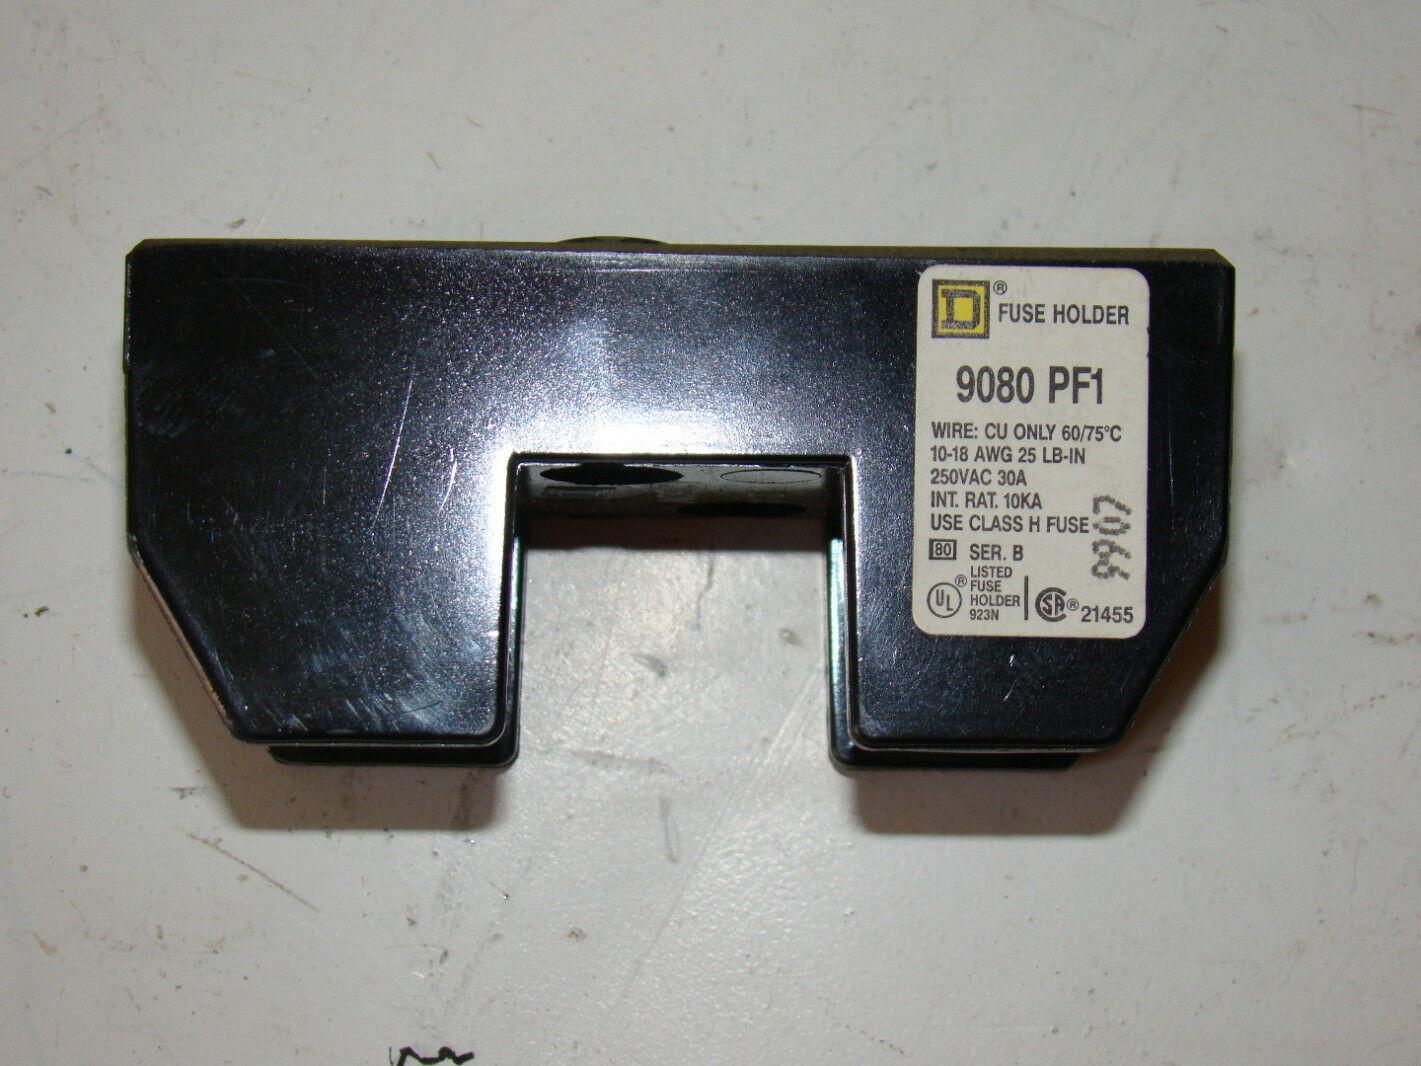 square d fuse holder 9080pf1 | ebay square d fuse box parts opel corsa d fuse box diagram